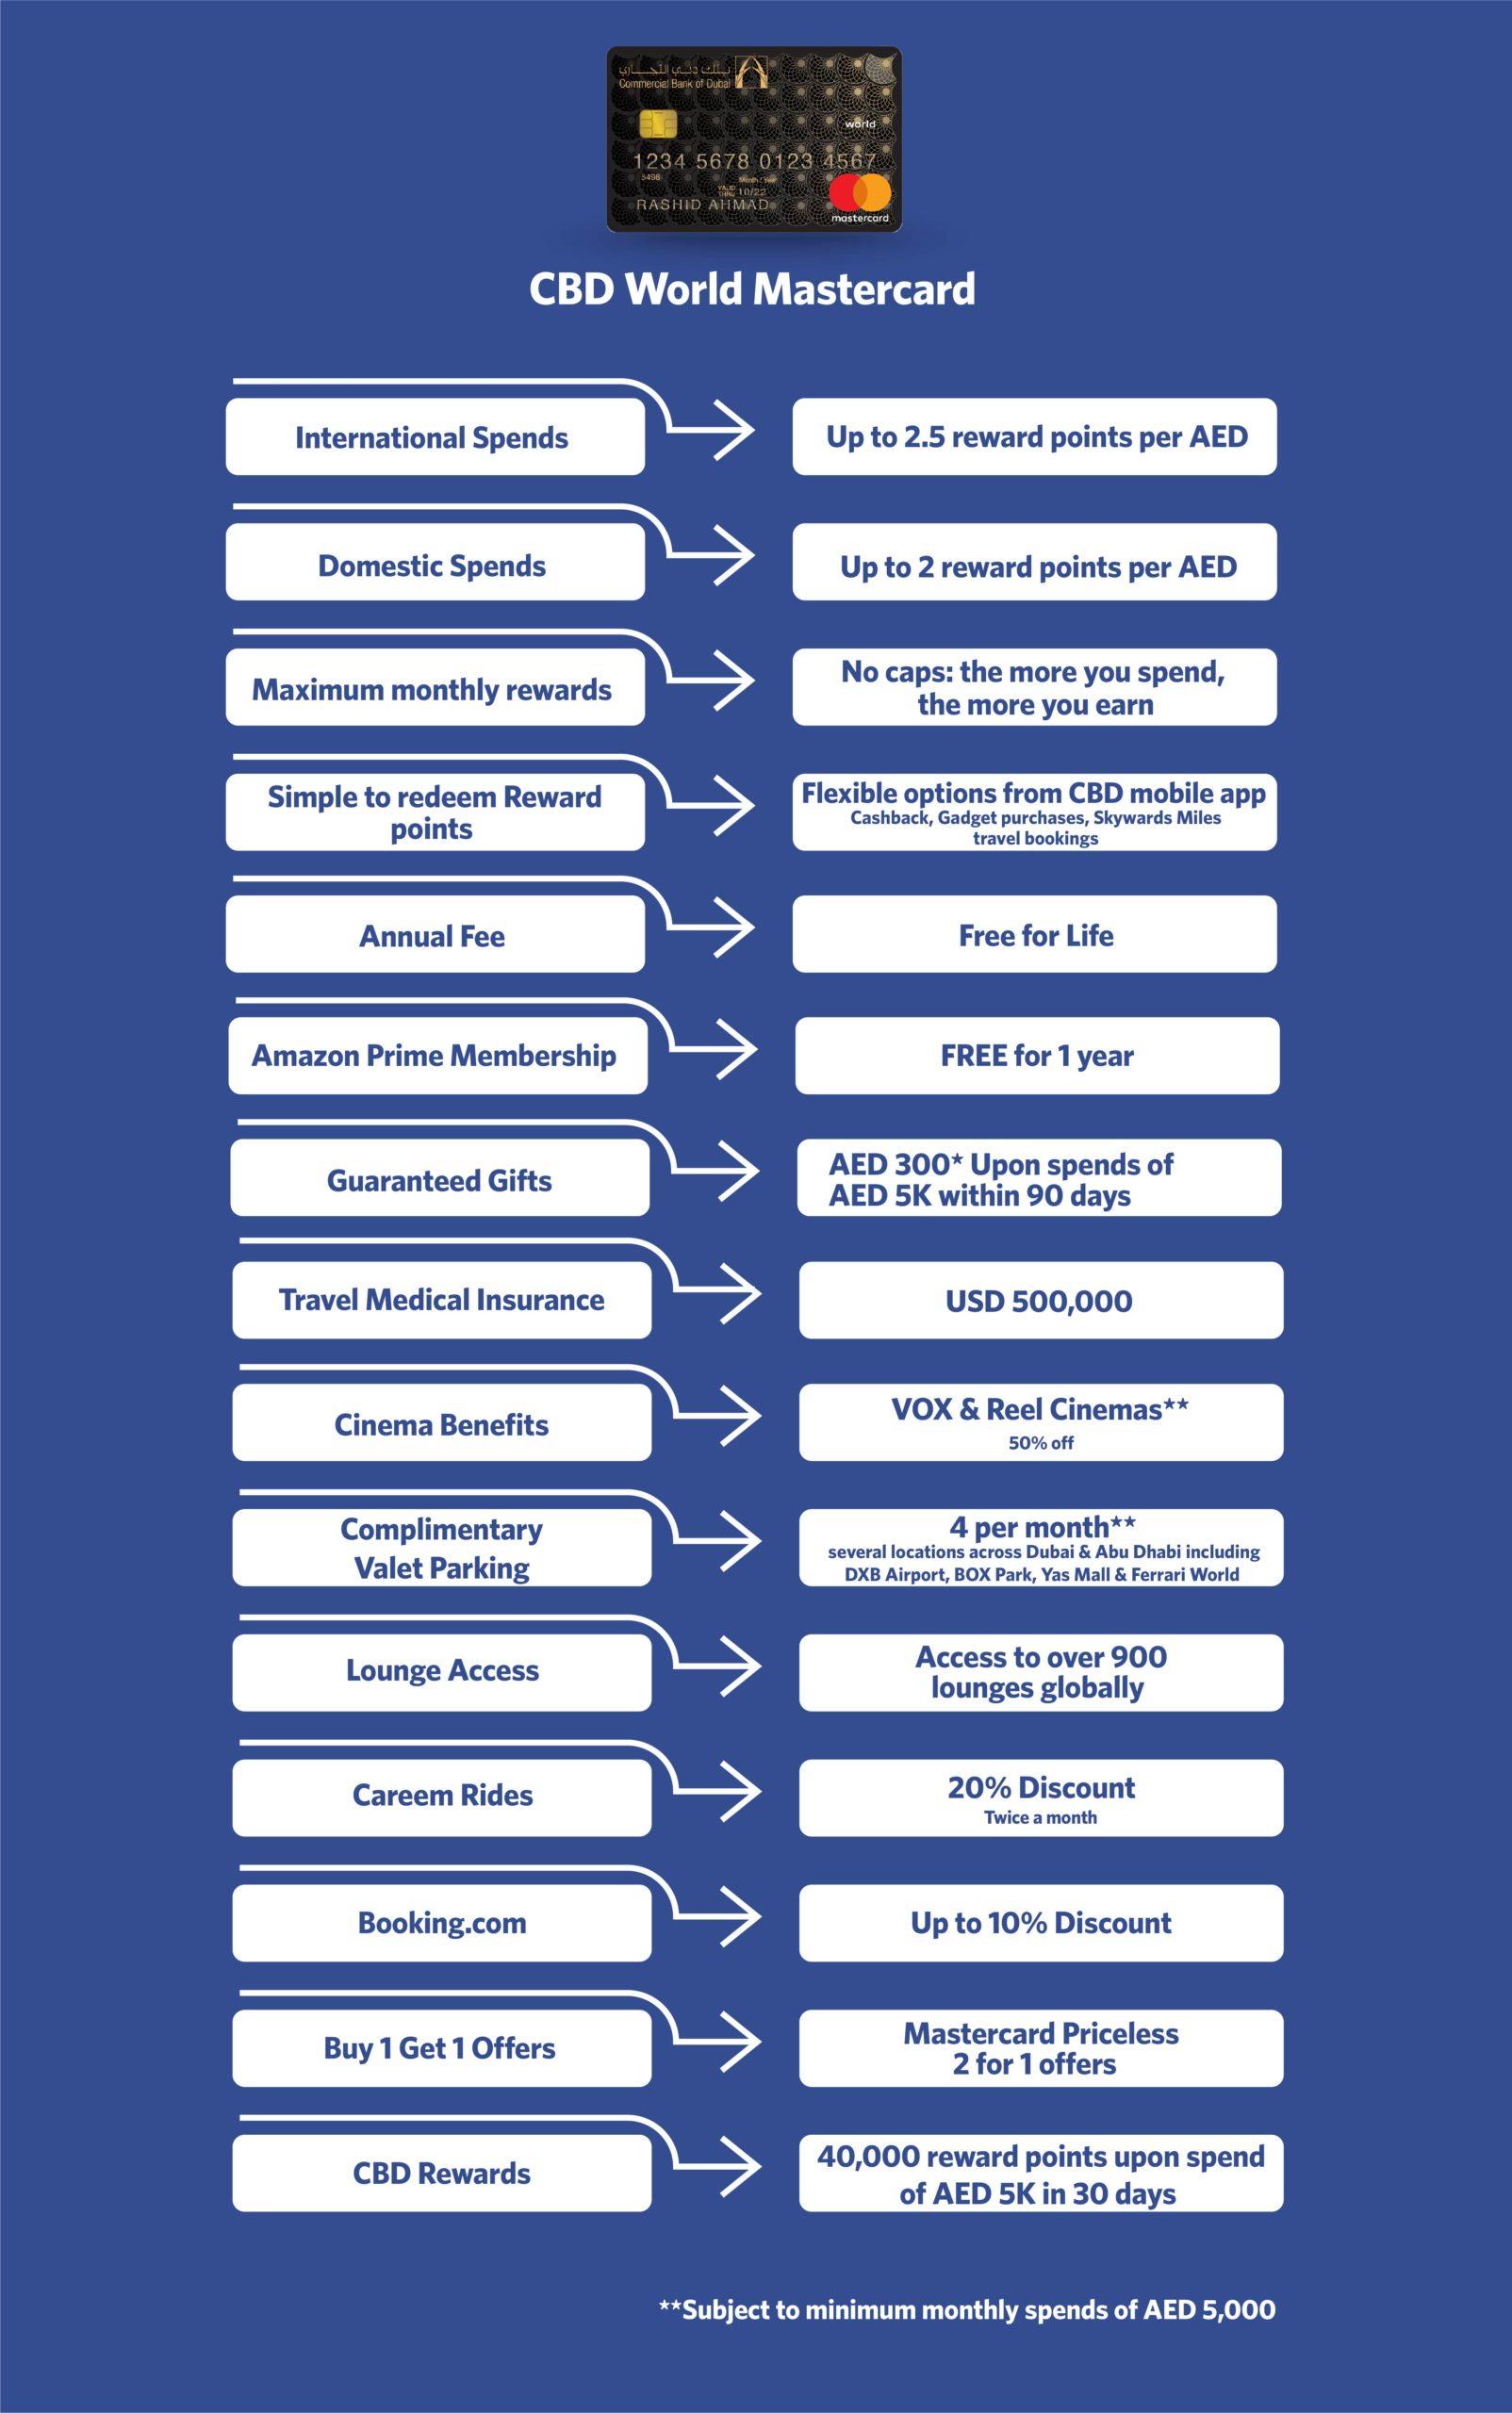 CBD World Mastercard Features